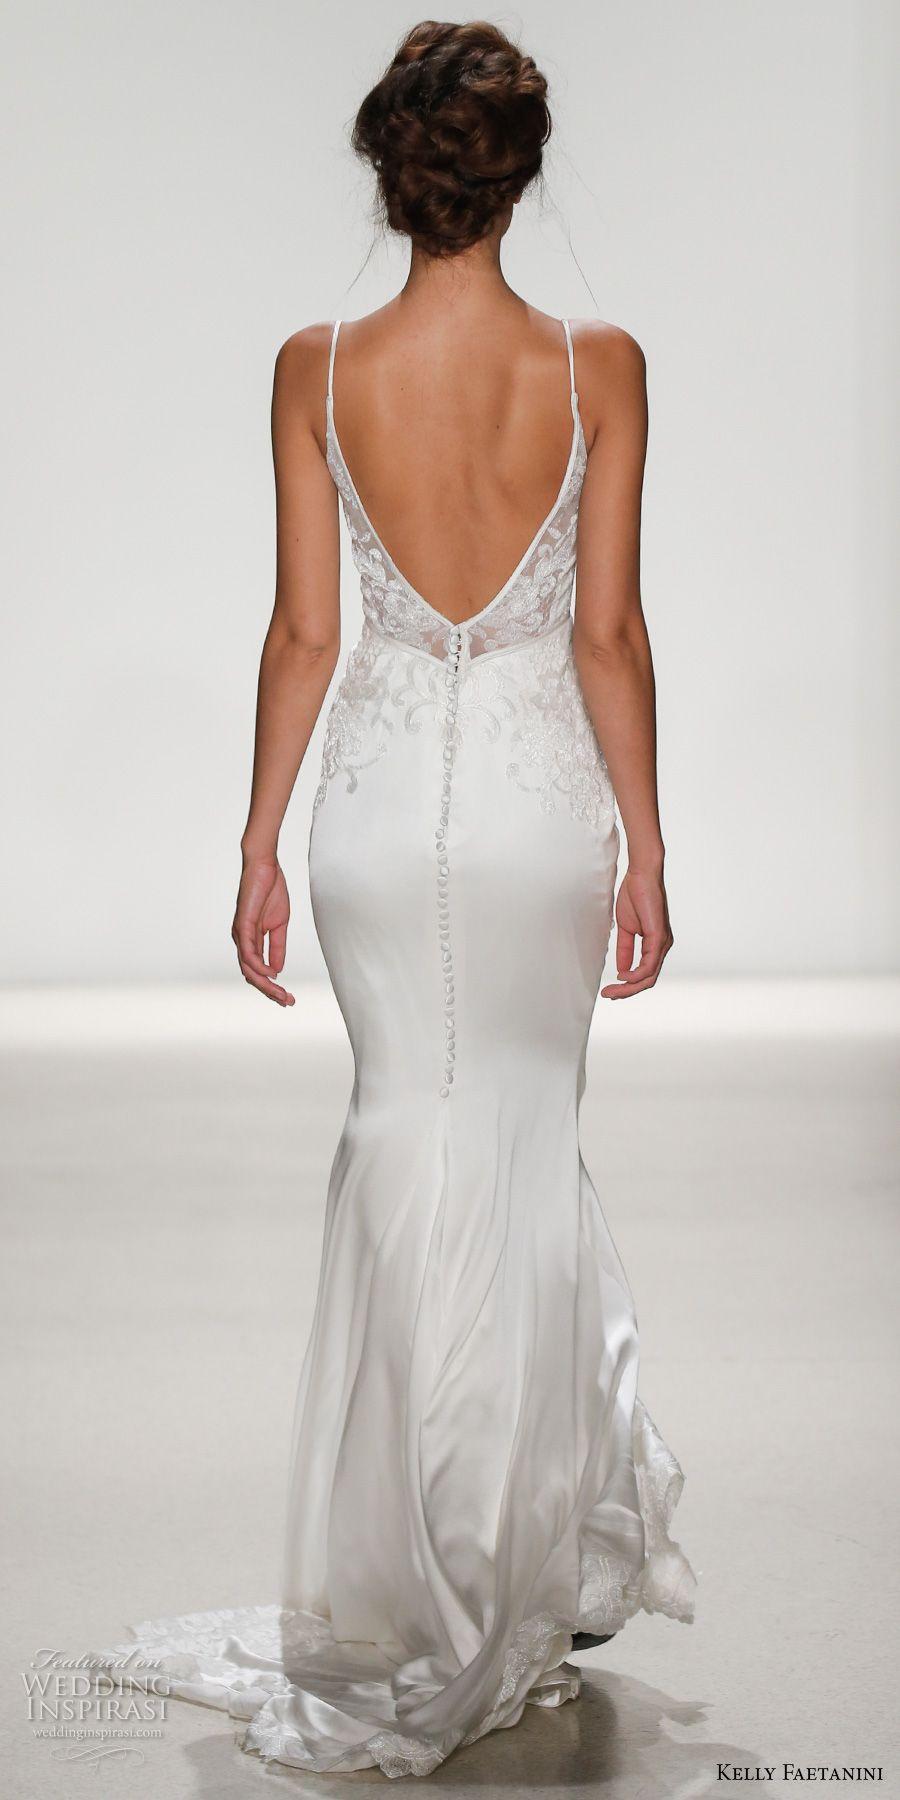 Kelly faetanini spring bridal spagetti strap v neck heavily